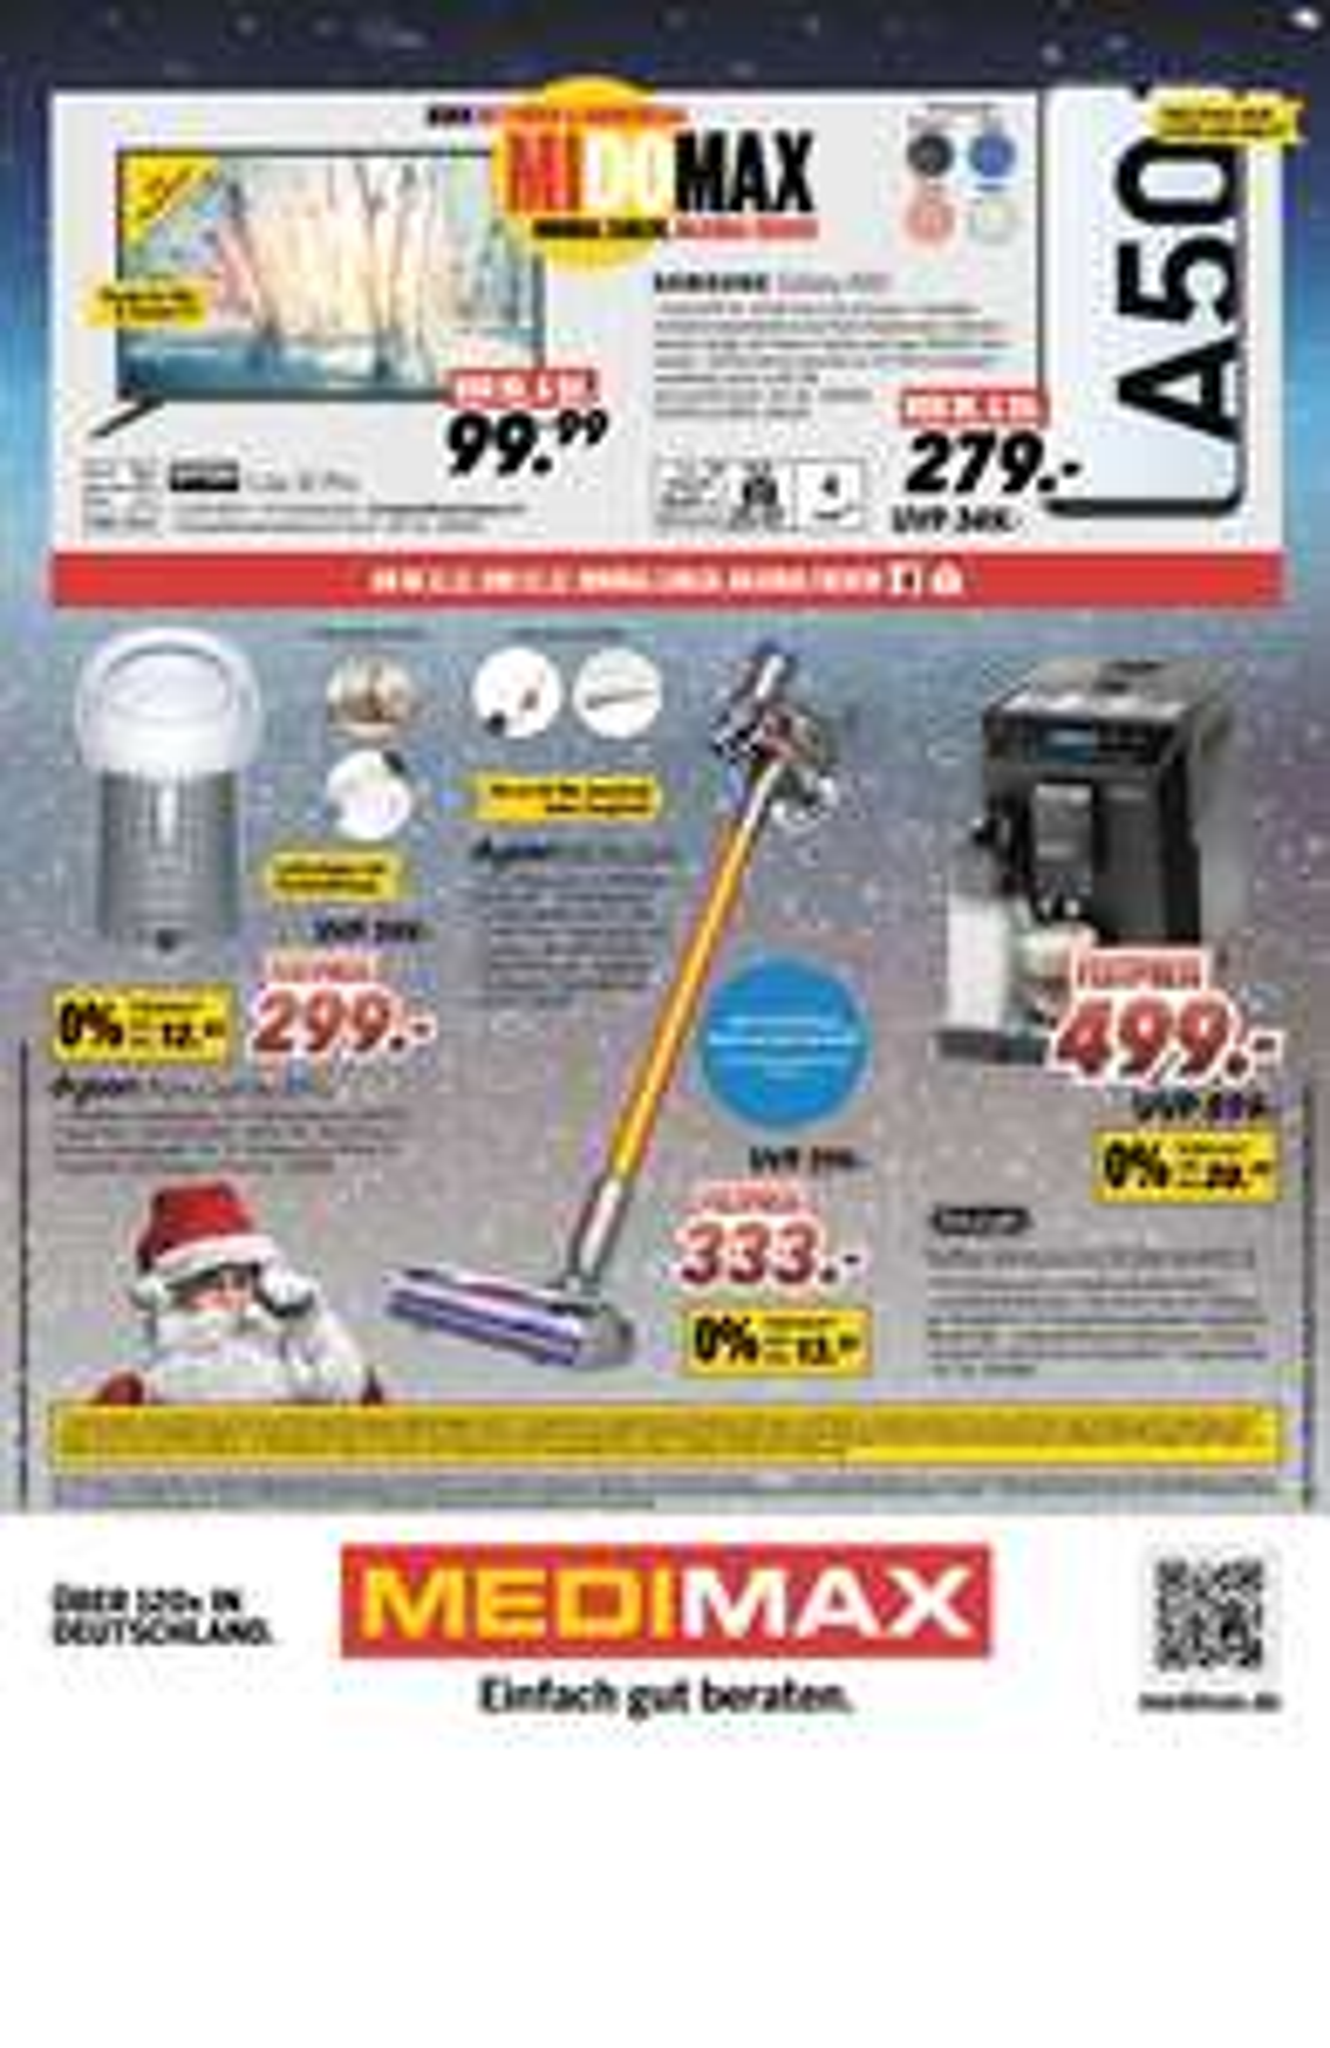 [LOKAL METTMANN] MEDIMAX DYON LIVE 32 Pro, LED-Fernseher, Triple Tuner, HD Ready